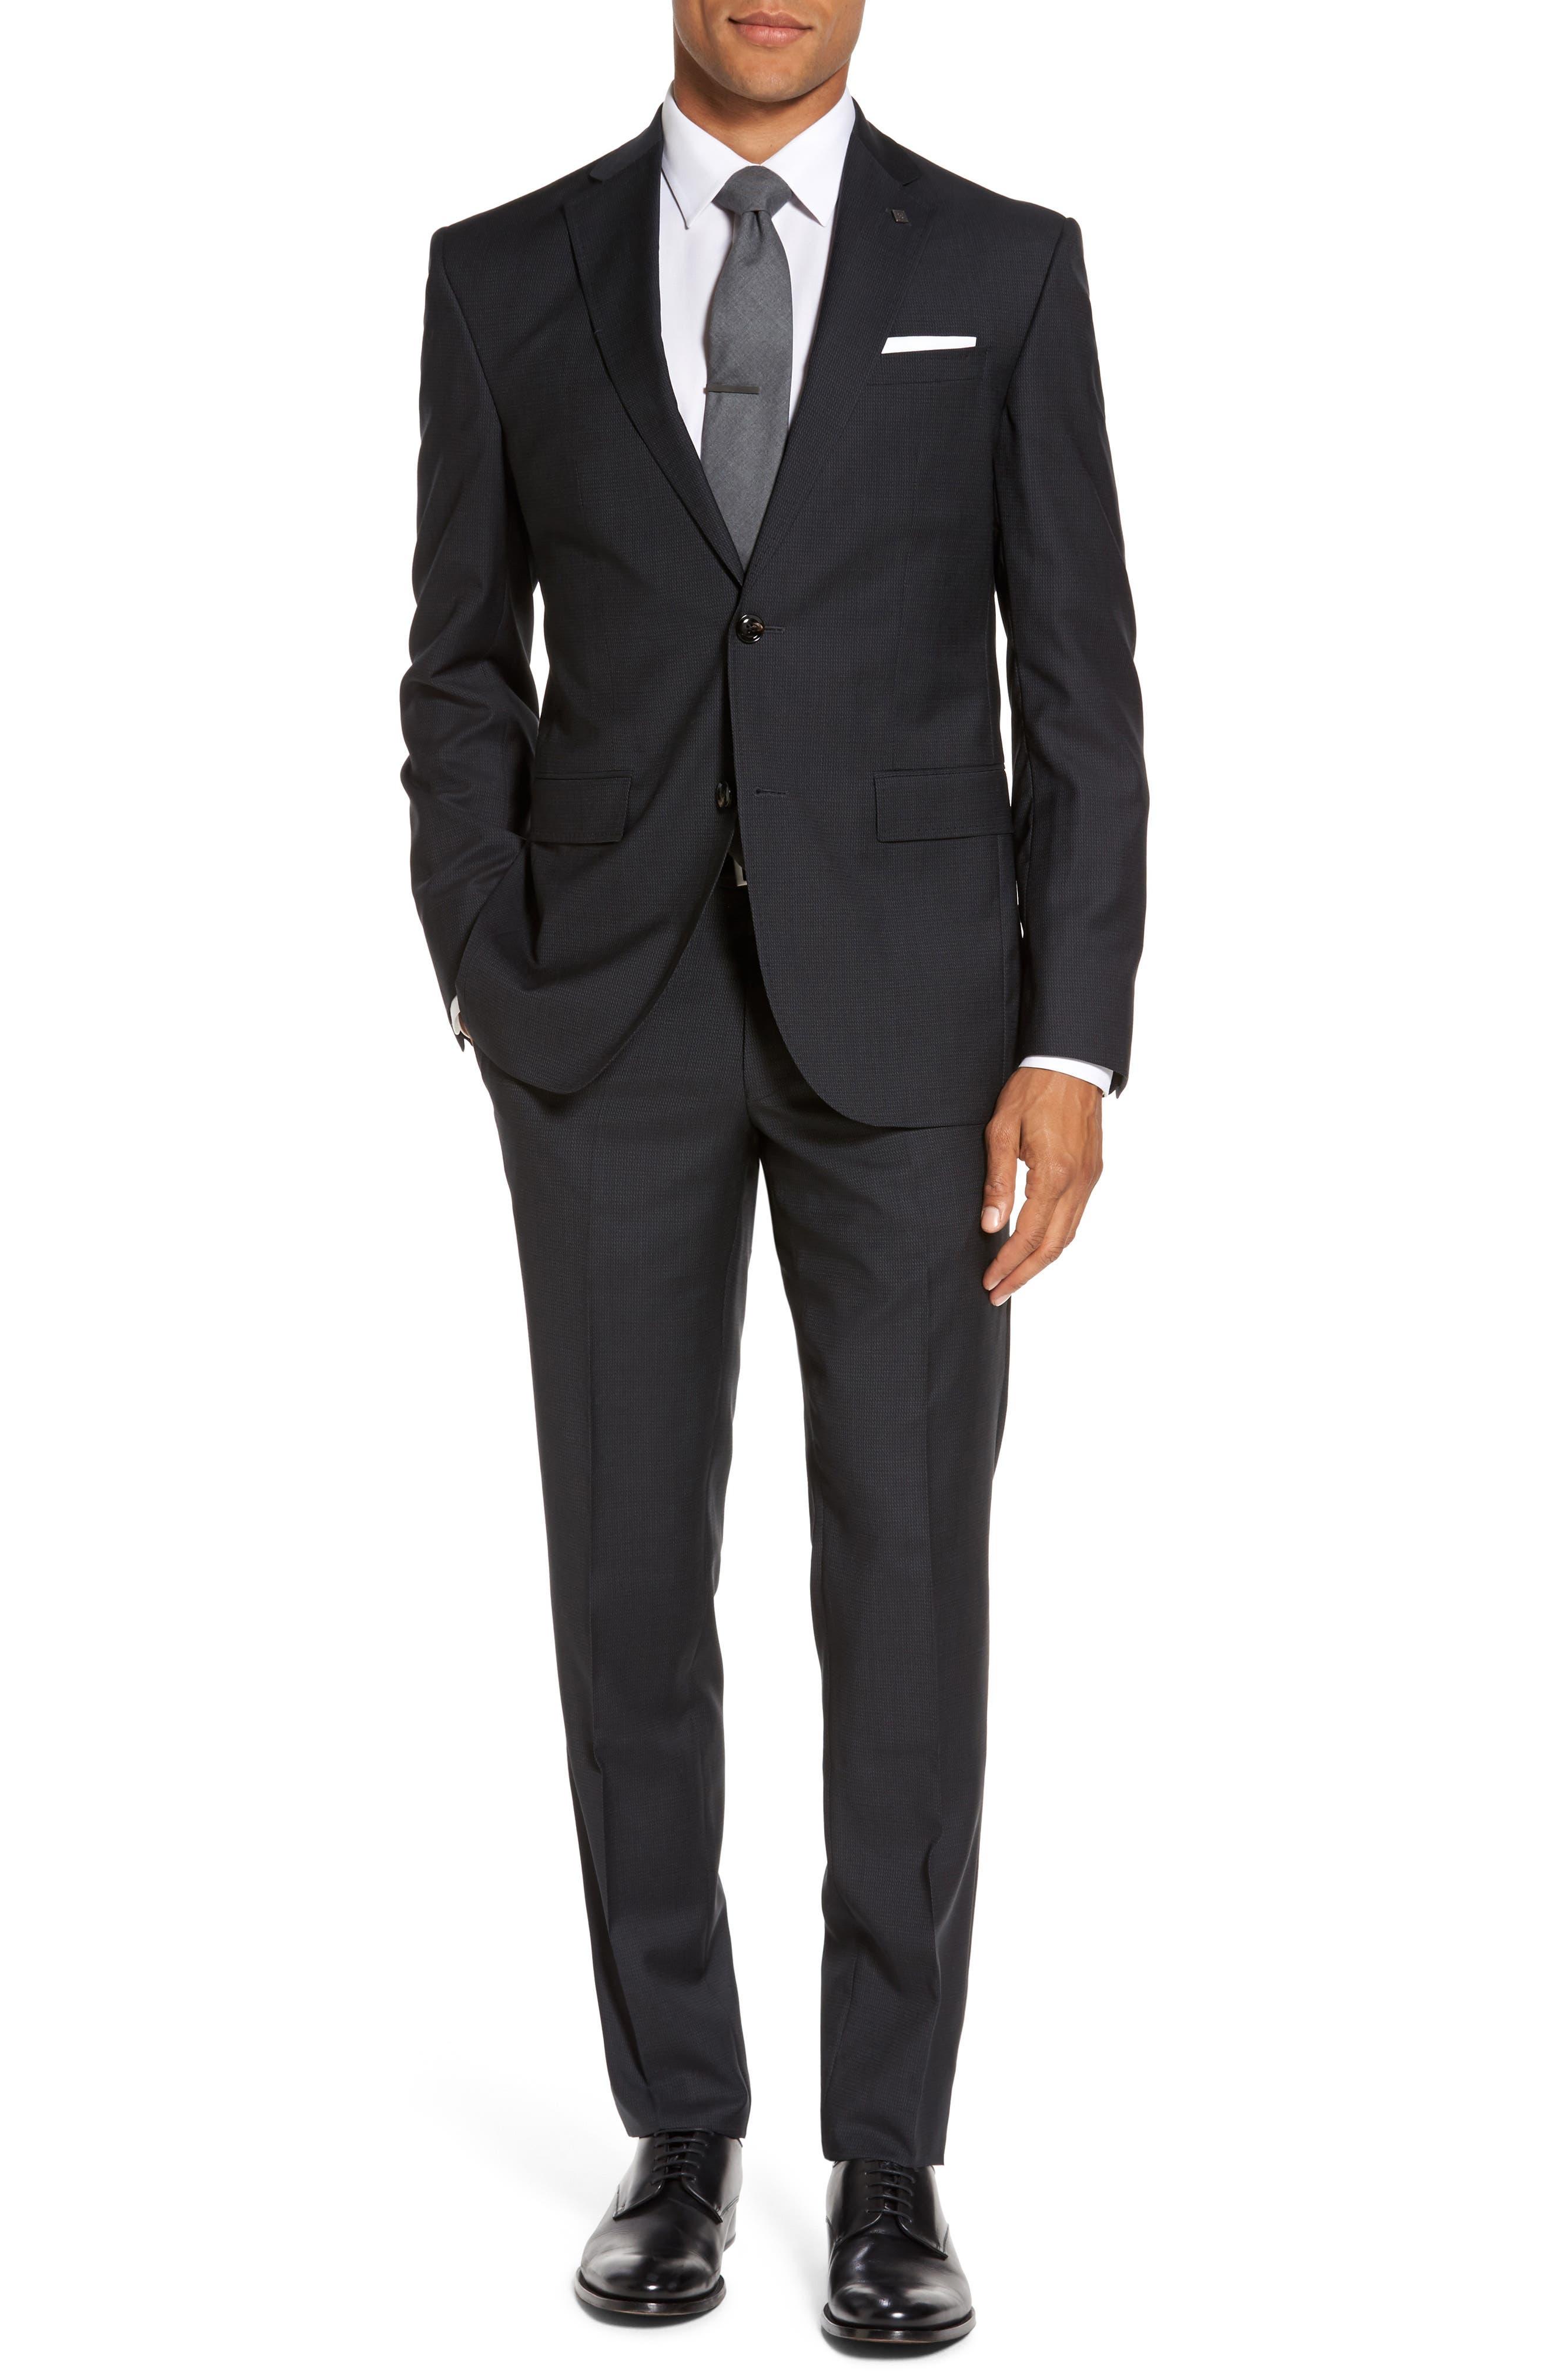 Roger Trim Fit Solid Wool Suit,                             Main thumbnail 1, color,                             001